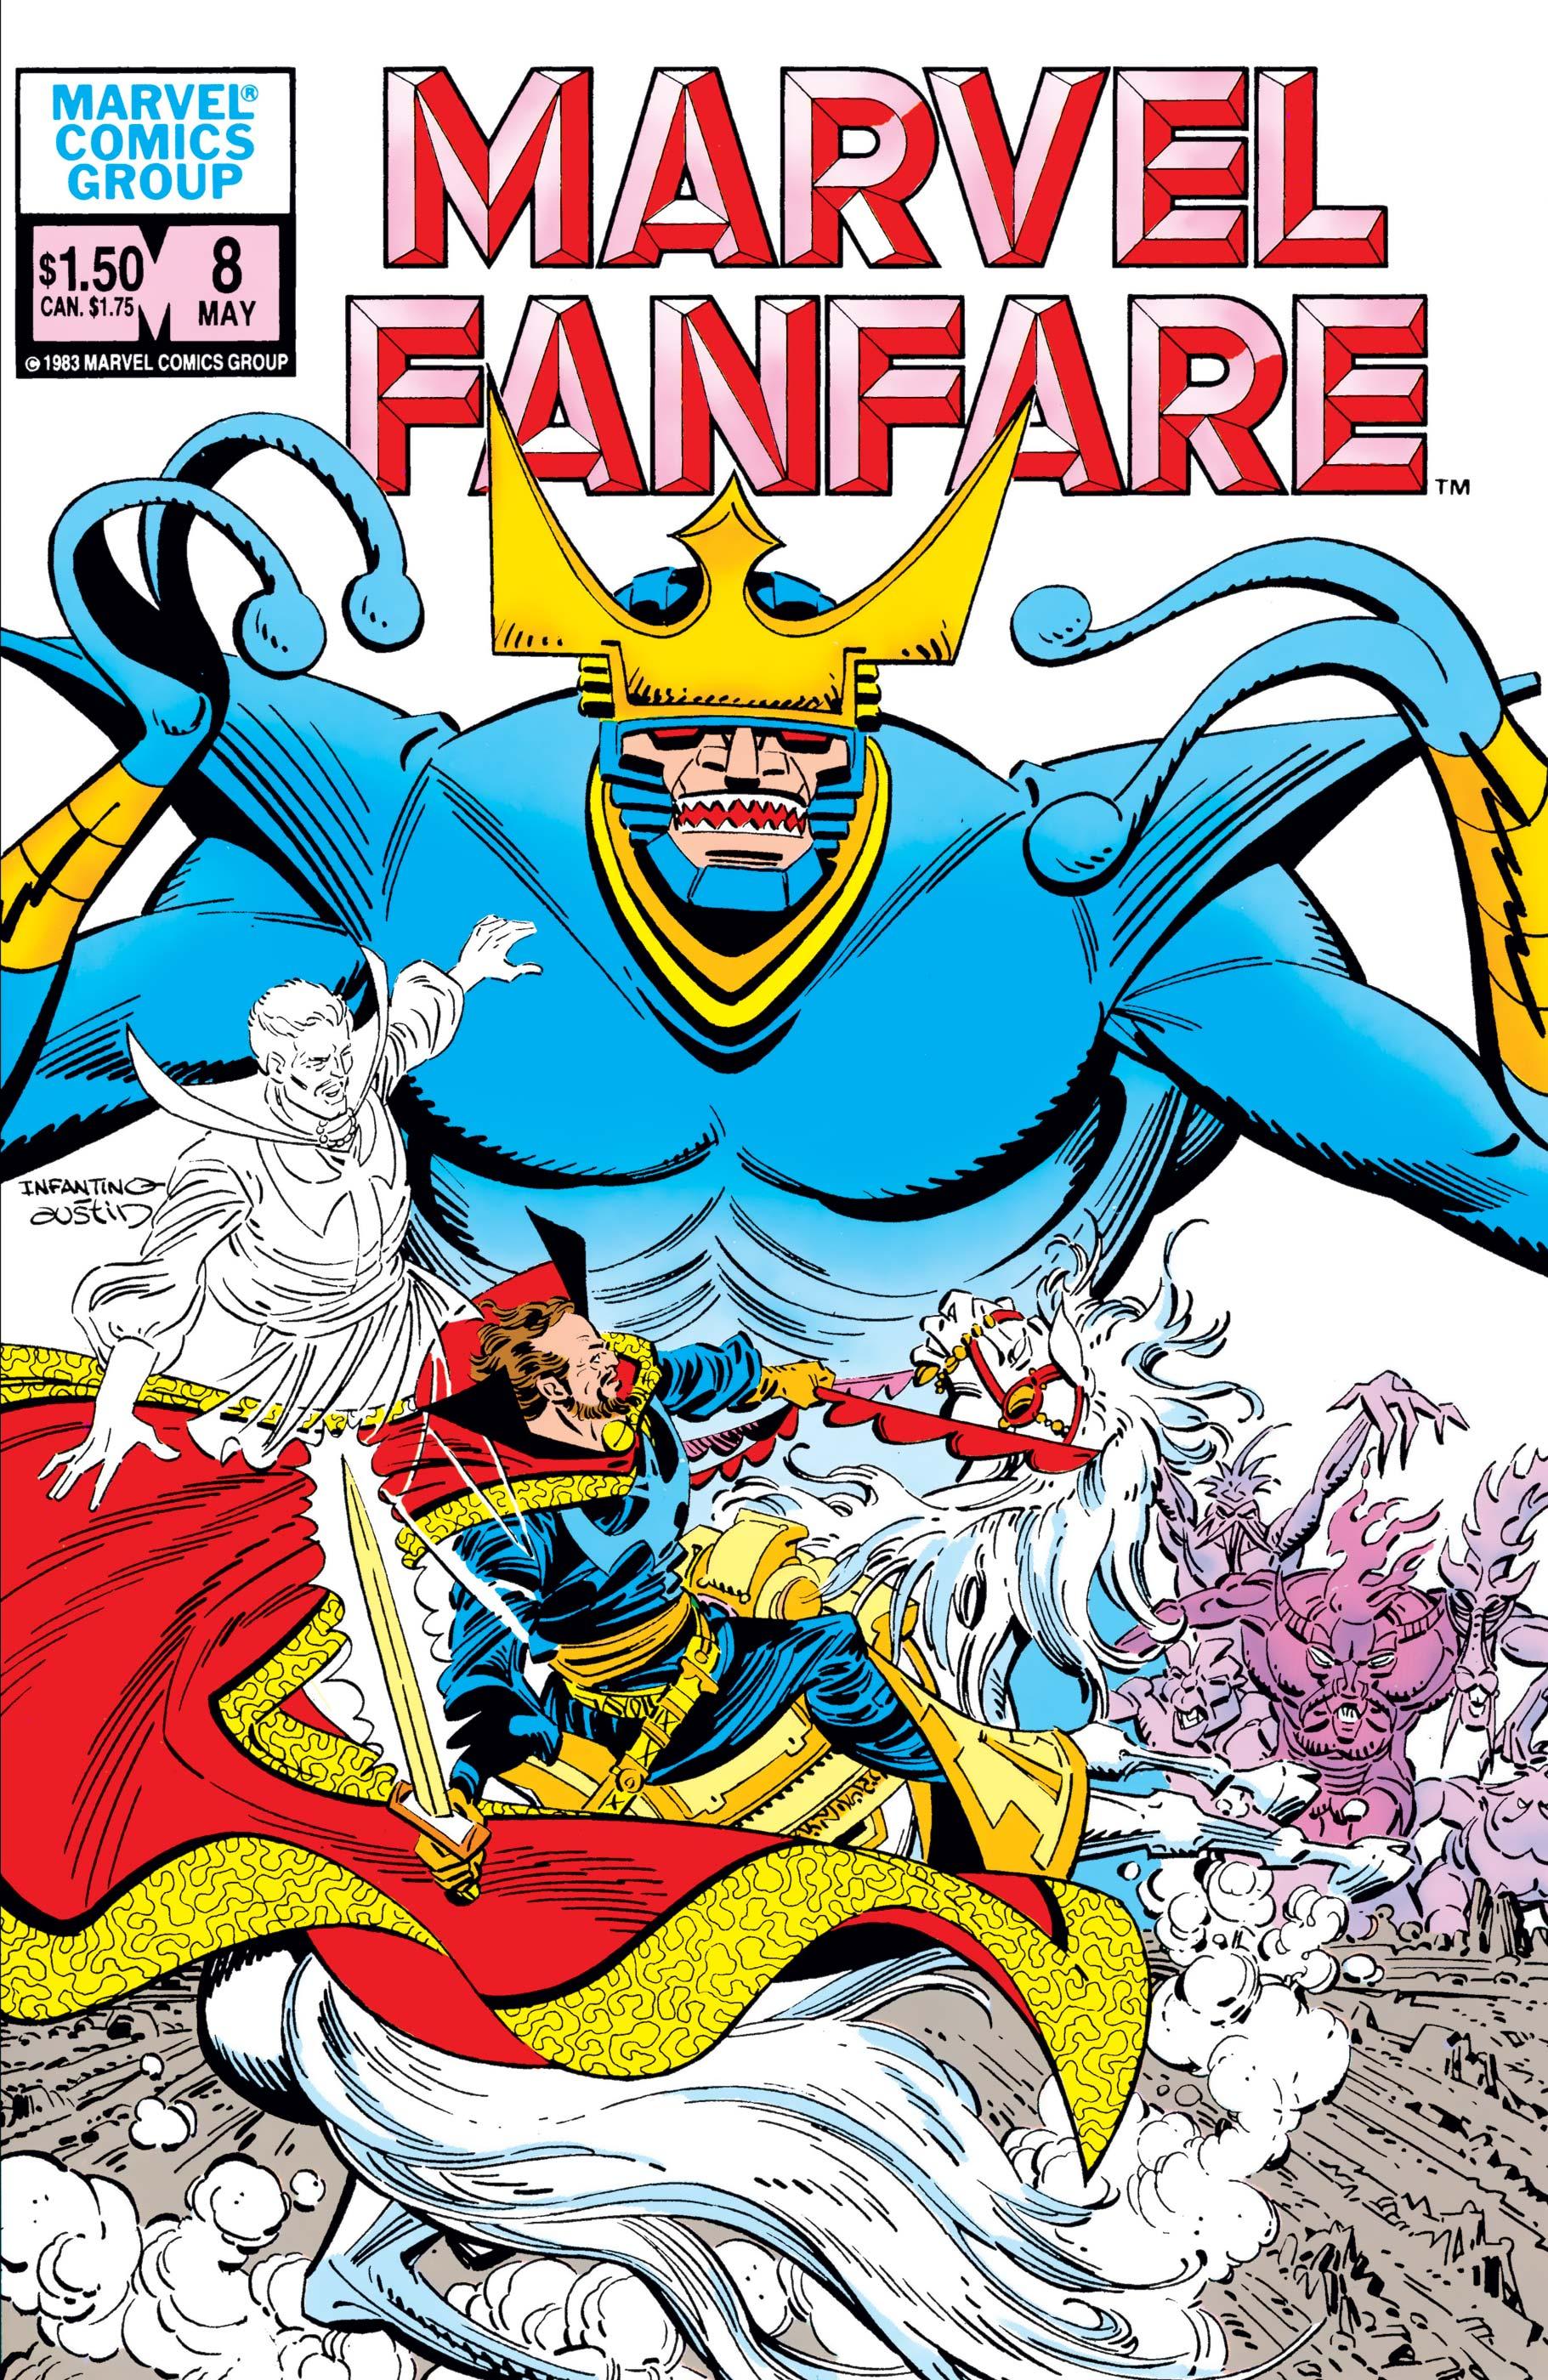 Marvel Fanfare (1982) #8